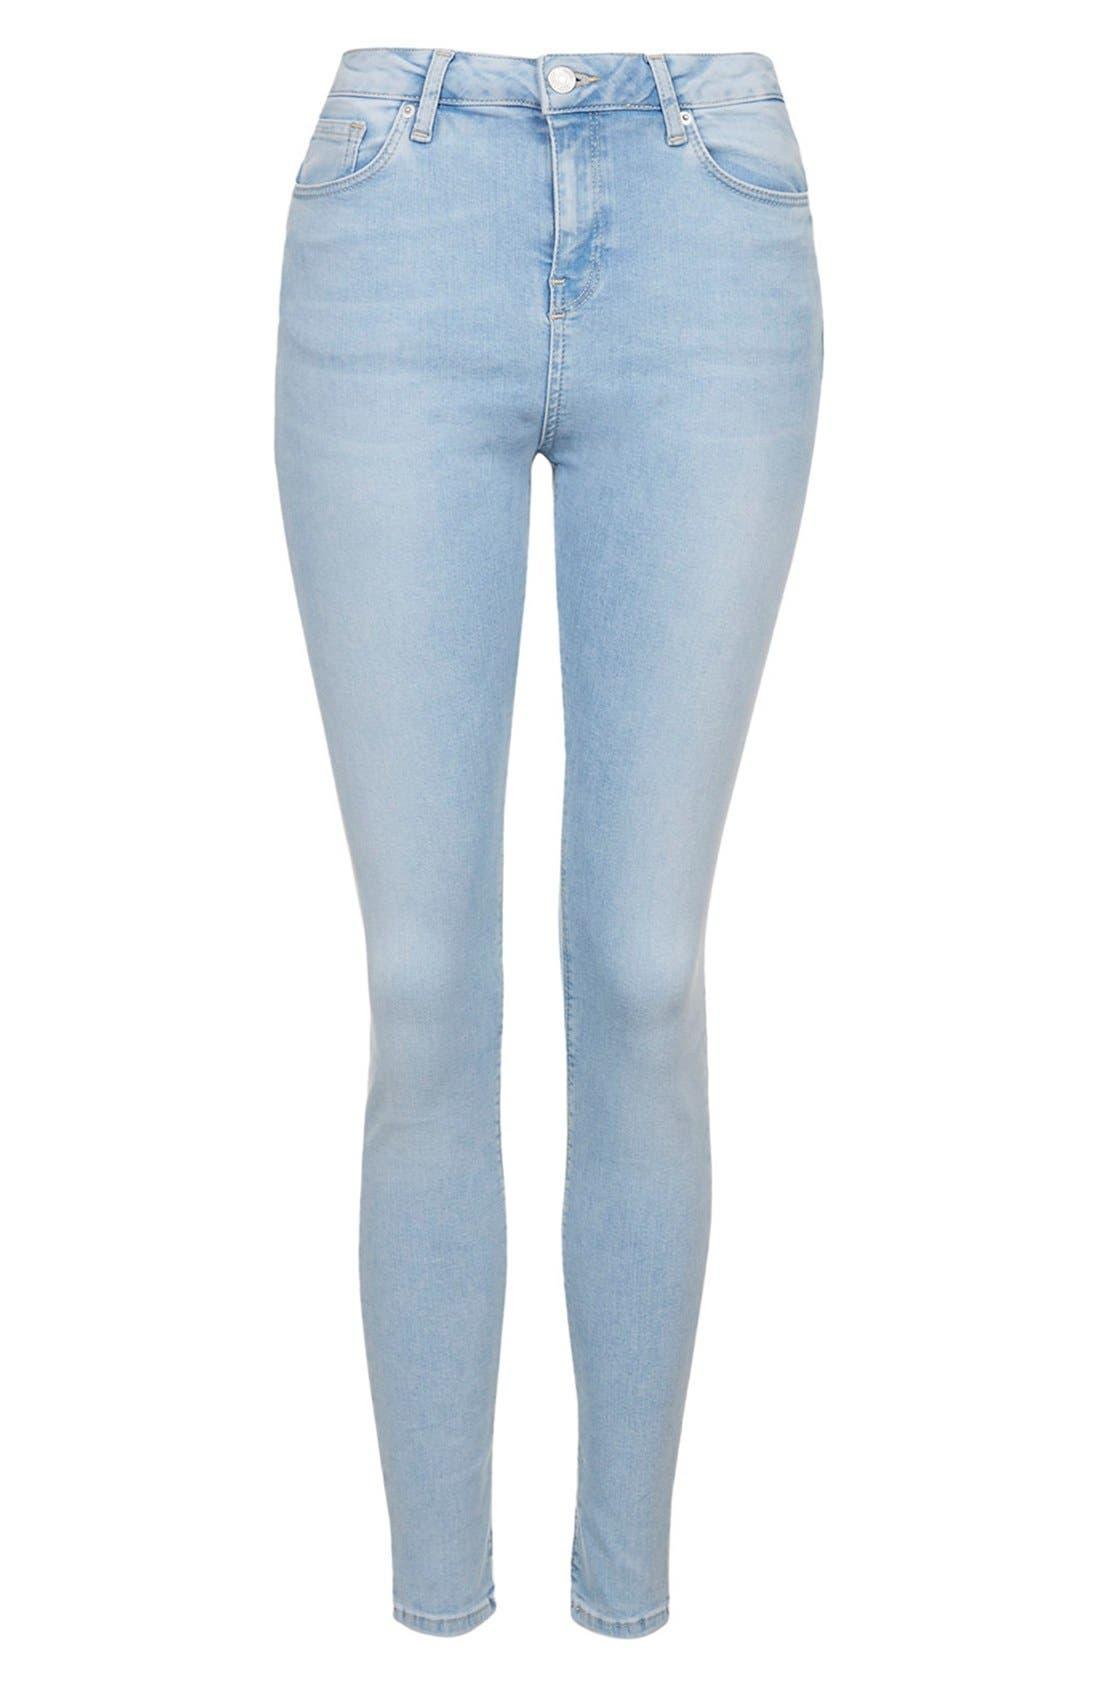 Alternate Image 3  - Topshop Moto 'Jamie' Bleached Skinny Jeans (Light Denim) (Regular & Short)